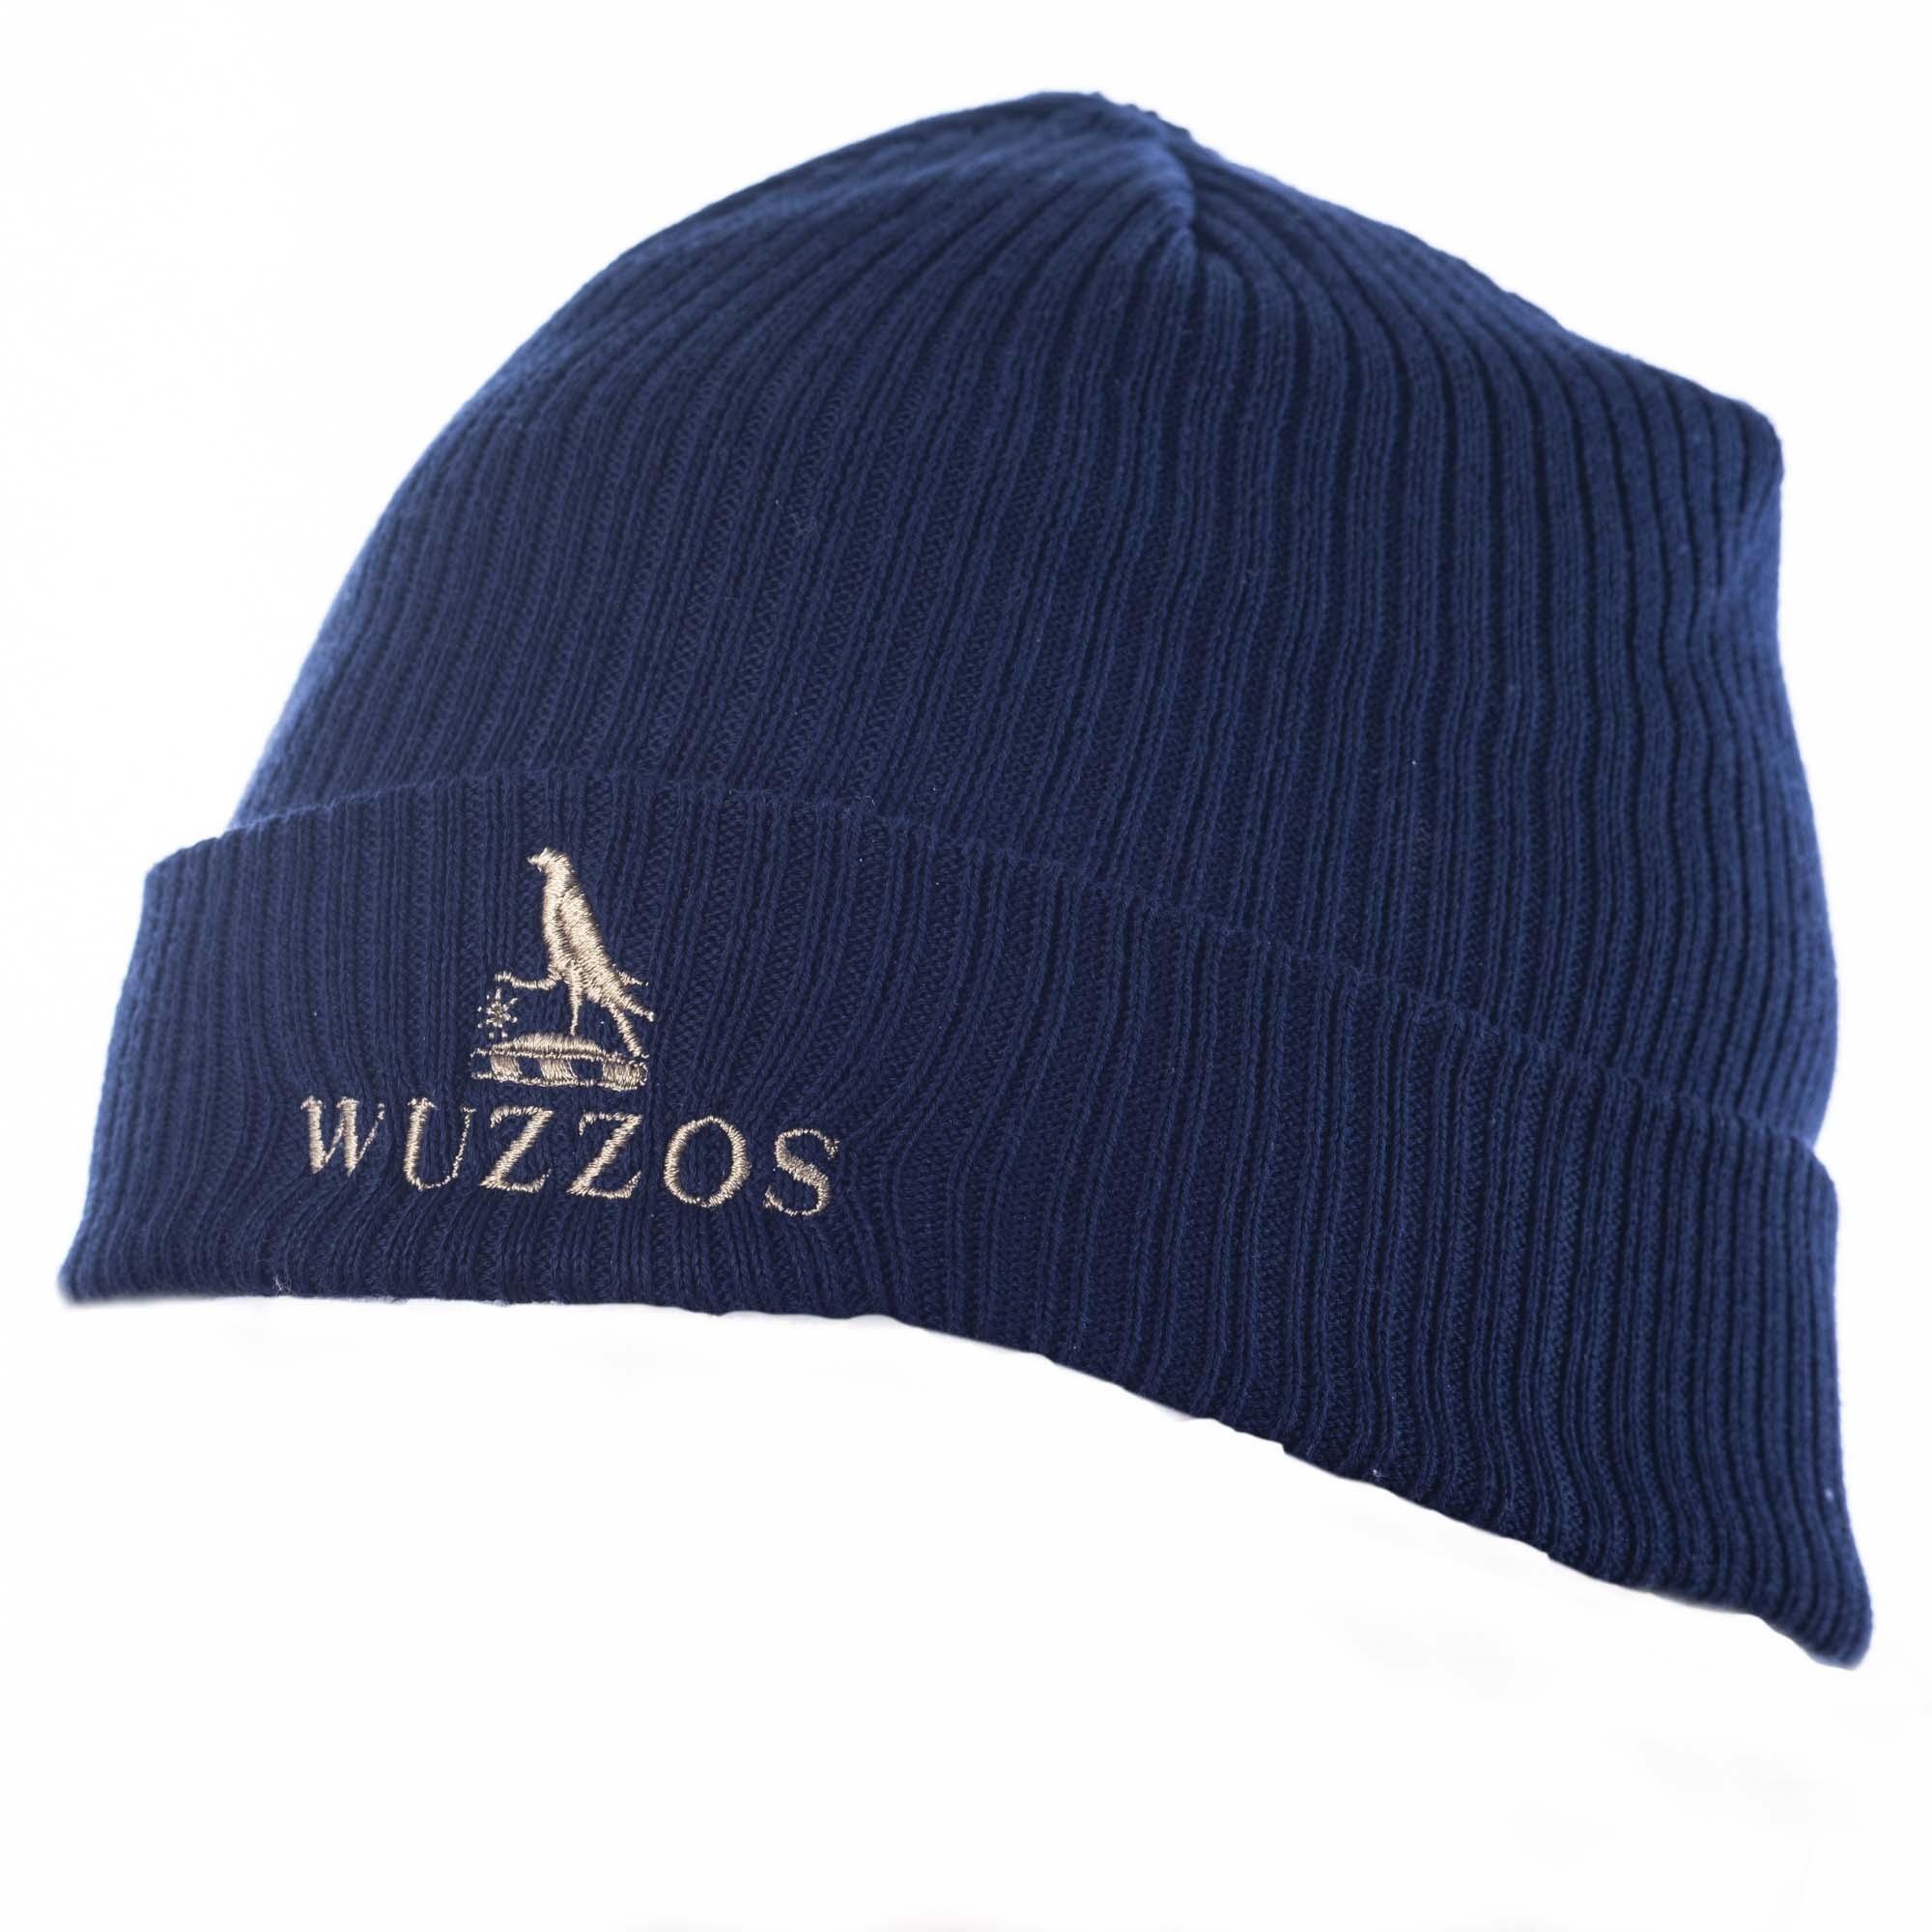 Upsells Wuzzos